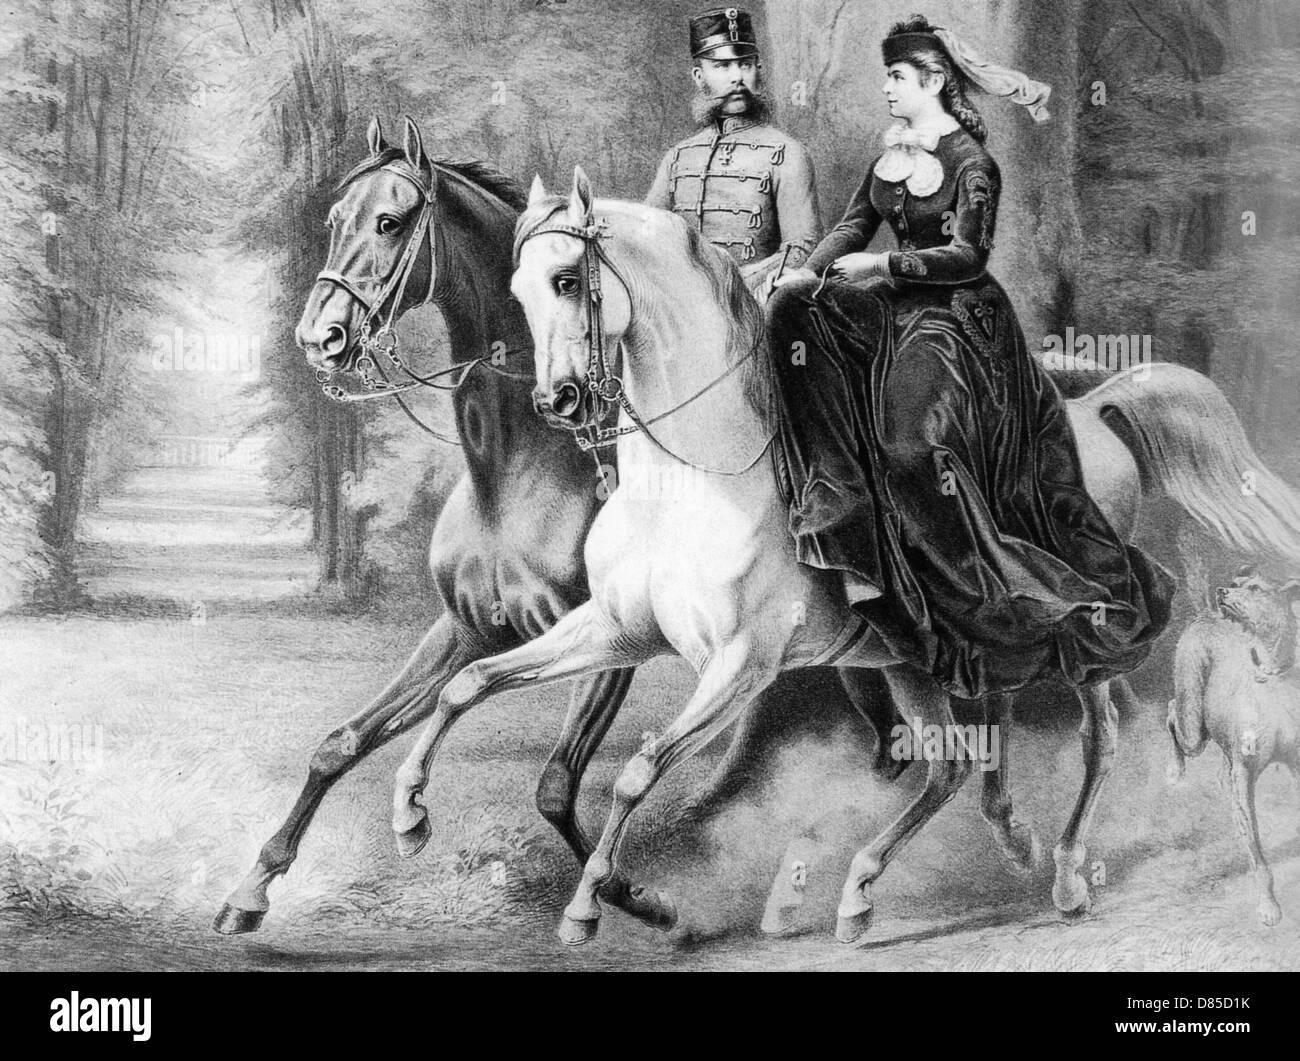 EMPRESS ELISABETH OF AUSTRIA (1837-1898) about 1865 - Stock Image